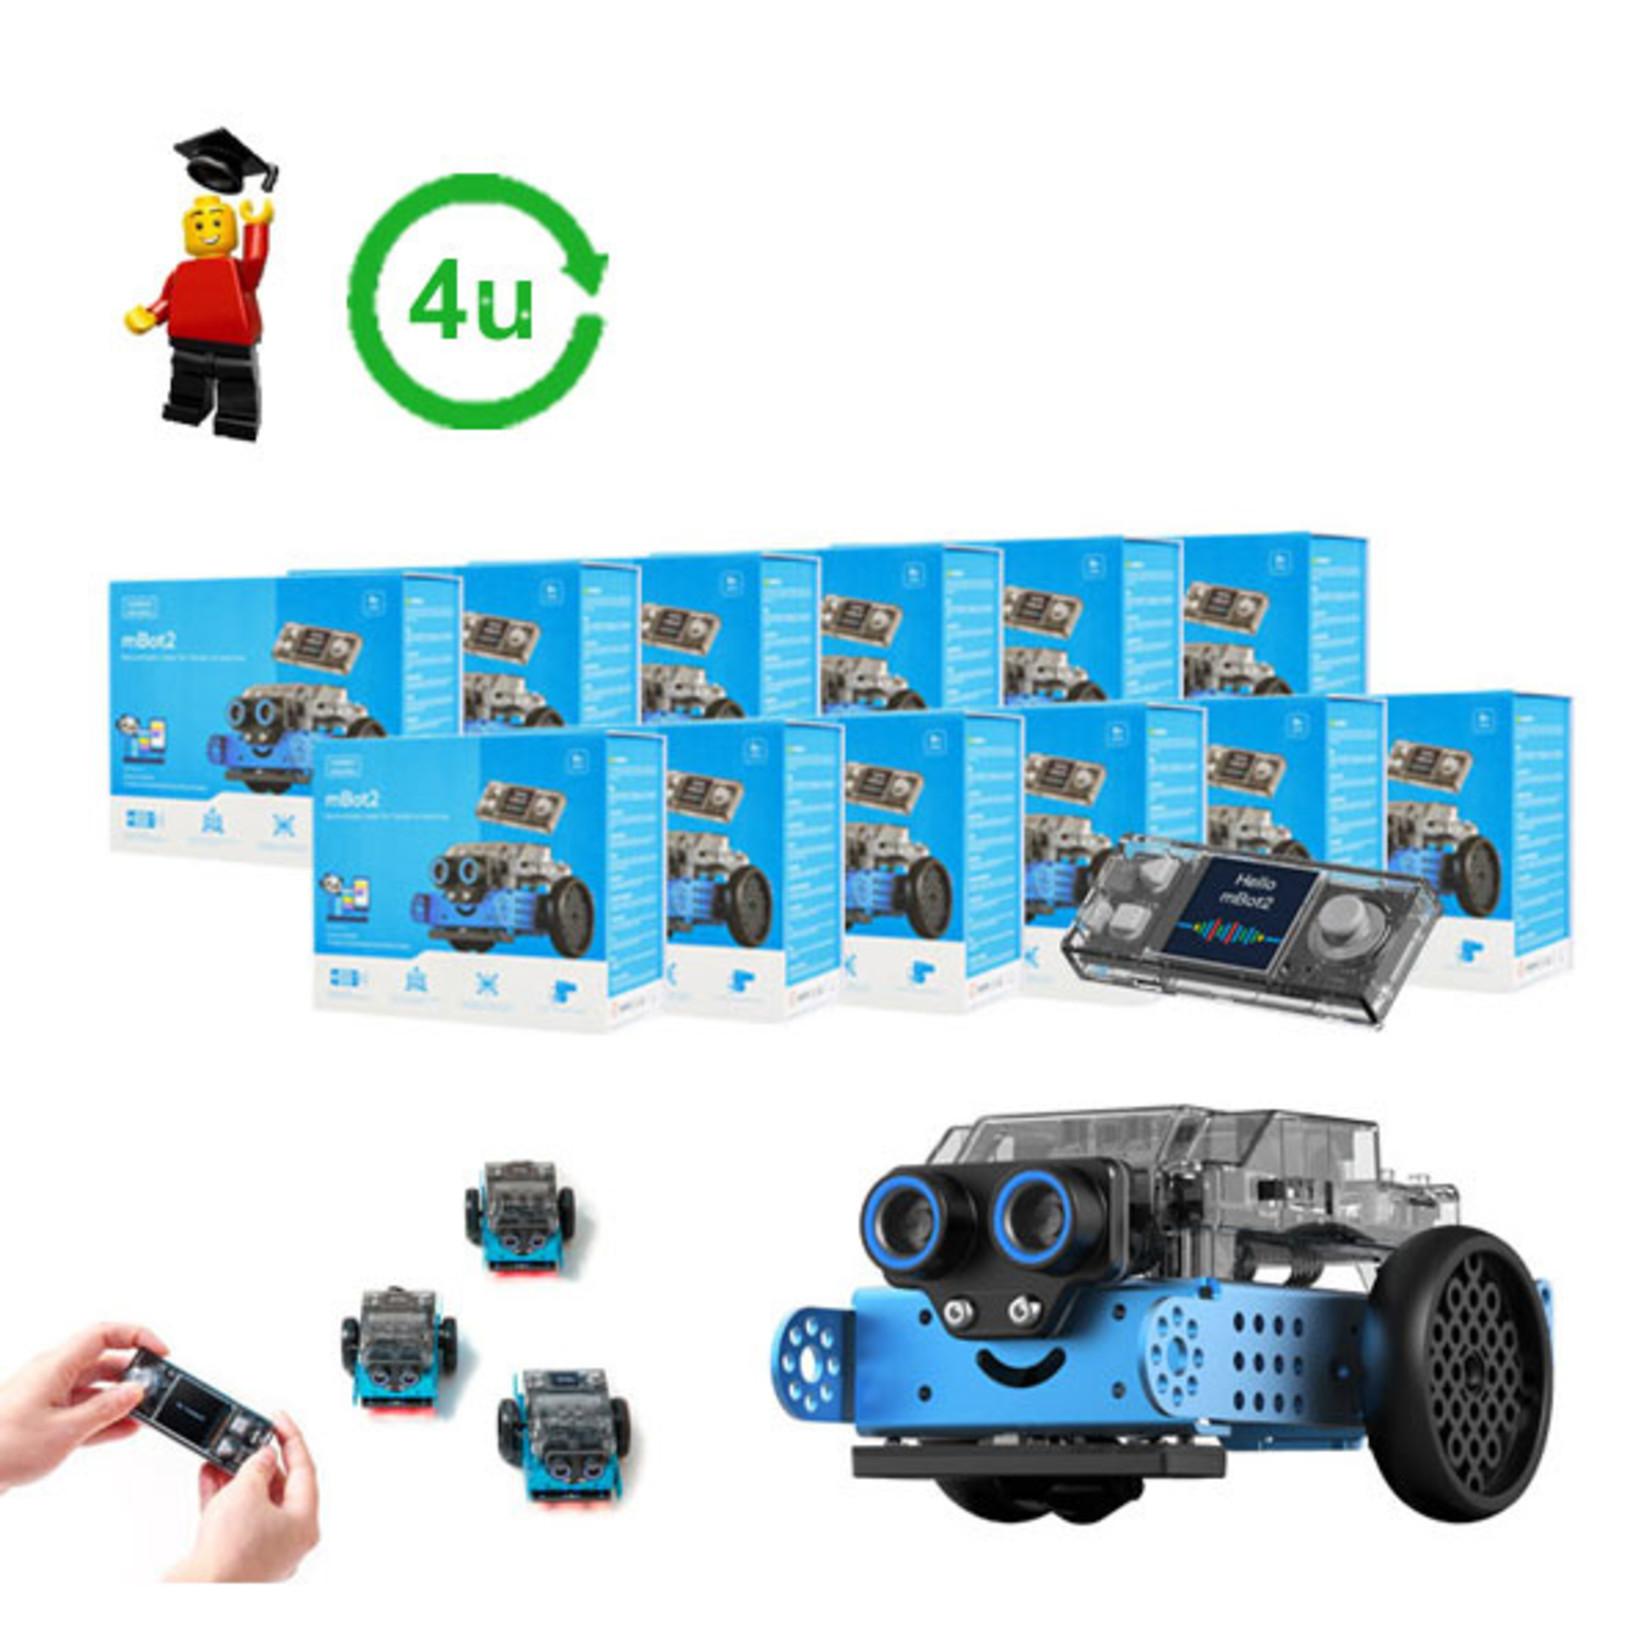 makeblock mBot2 klaspakket (12 stuks) + opleiding